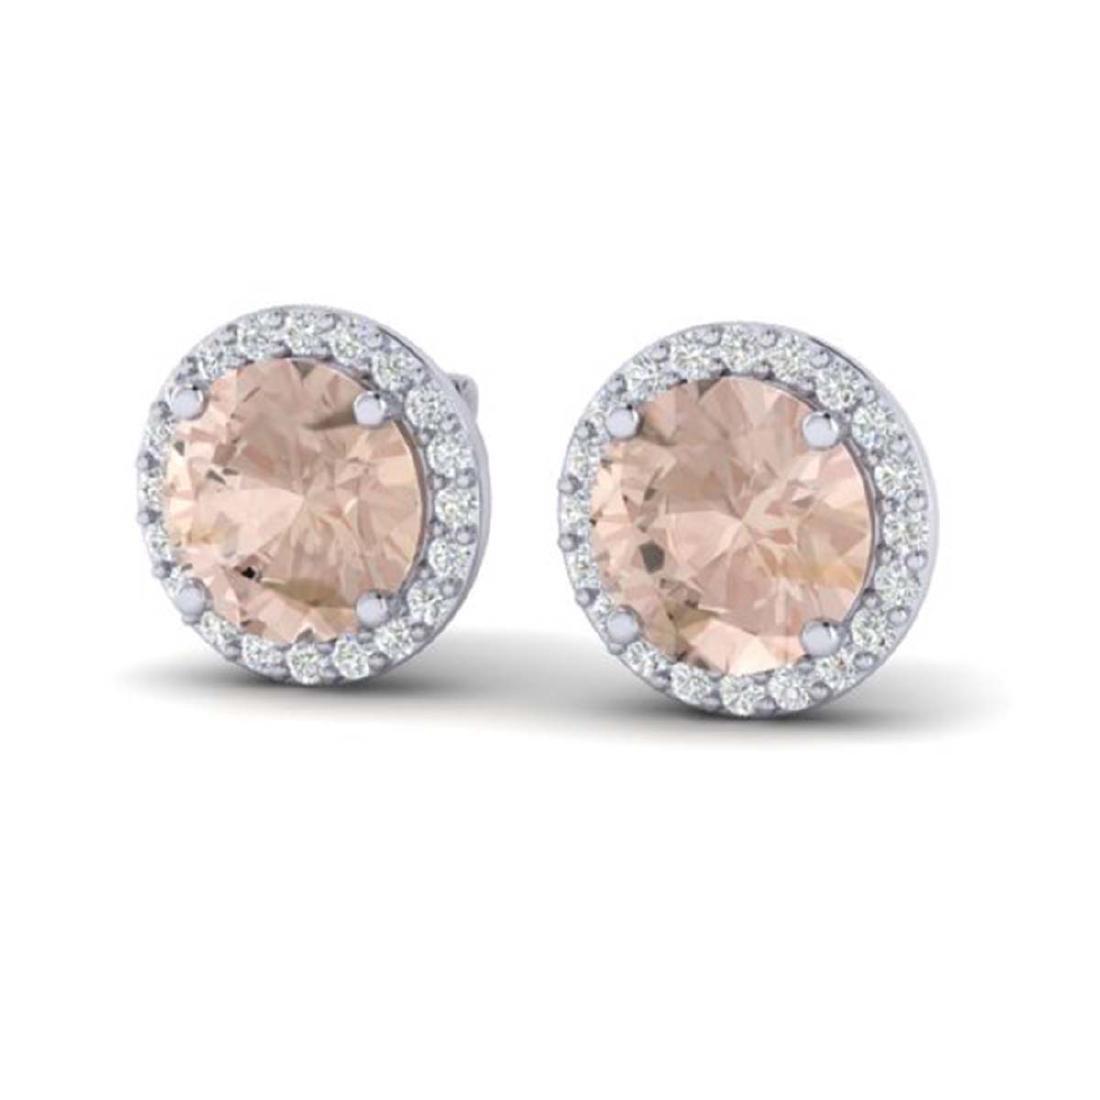 3 ctw Morganite & Halo VS/SI Diamond Earrings 18K White